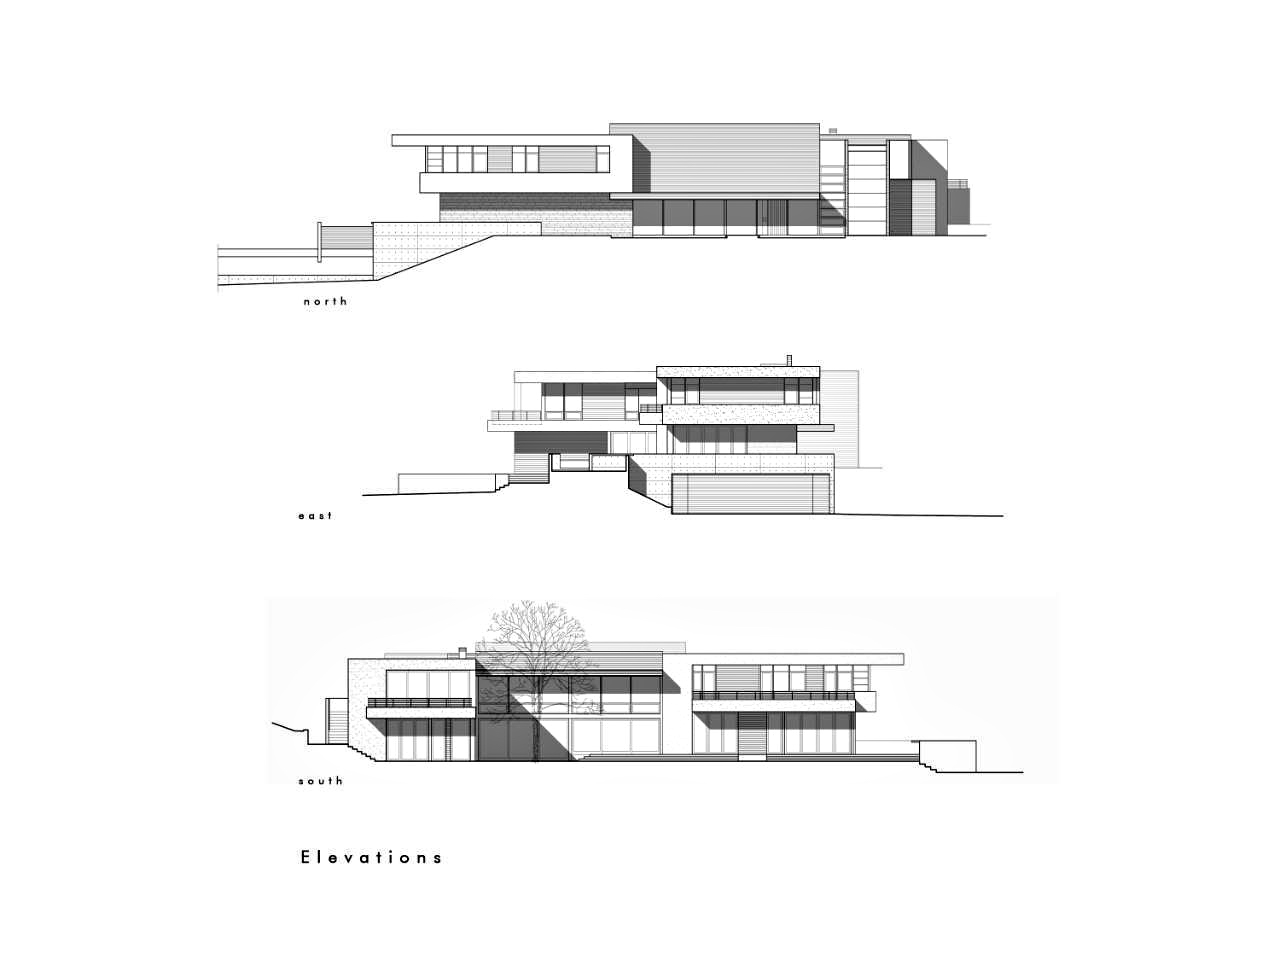 Elevations – Modern Luxury OZ Residence – 92 Sutherland Drive, Atherton, CA, USA